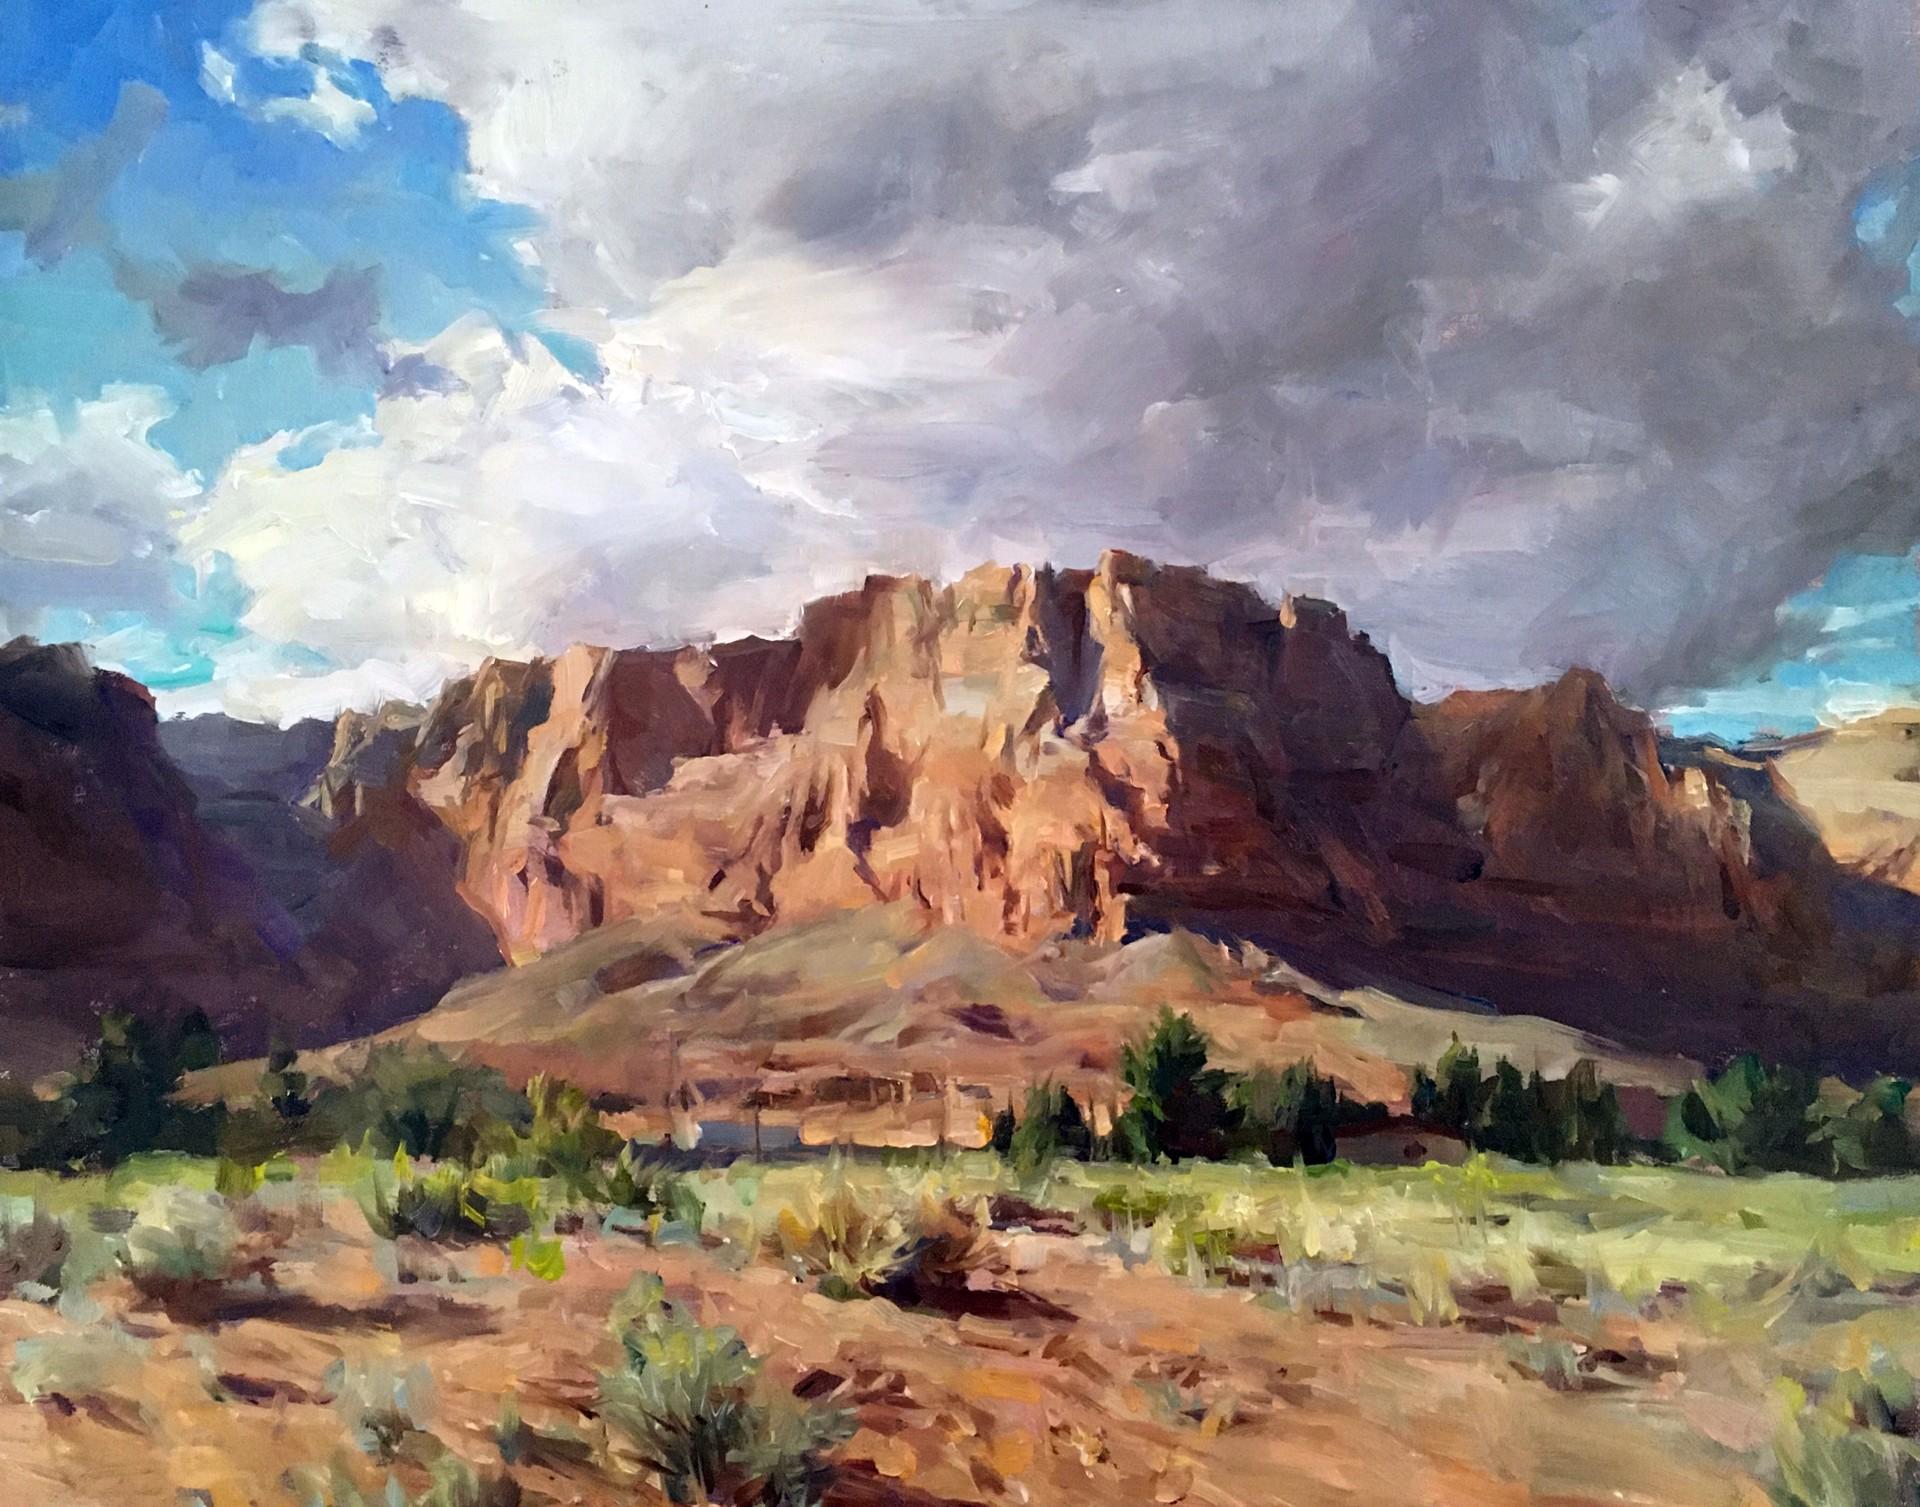 Vermillion Cliffs Evening by Kyle Ma